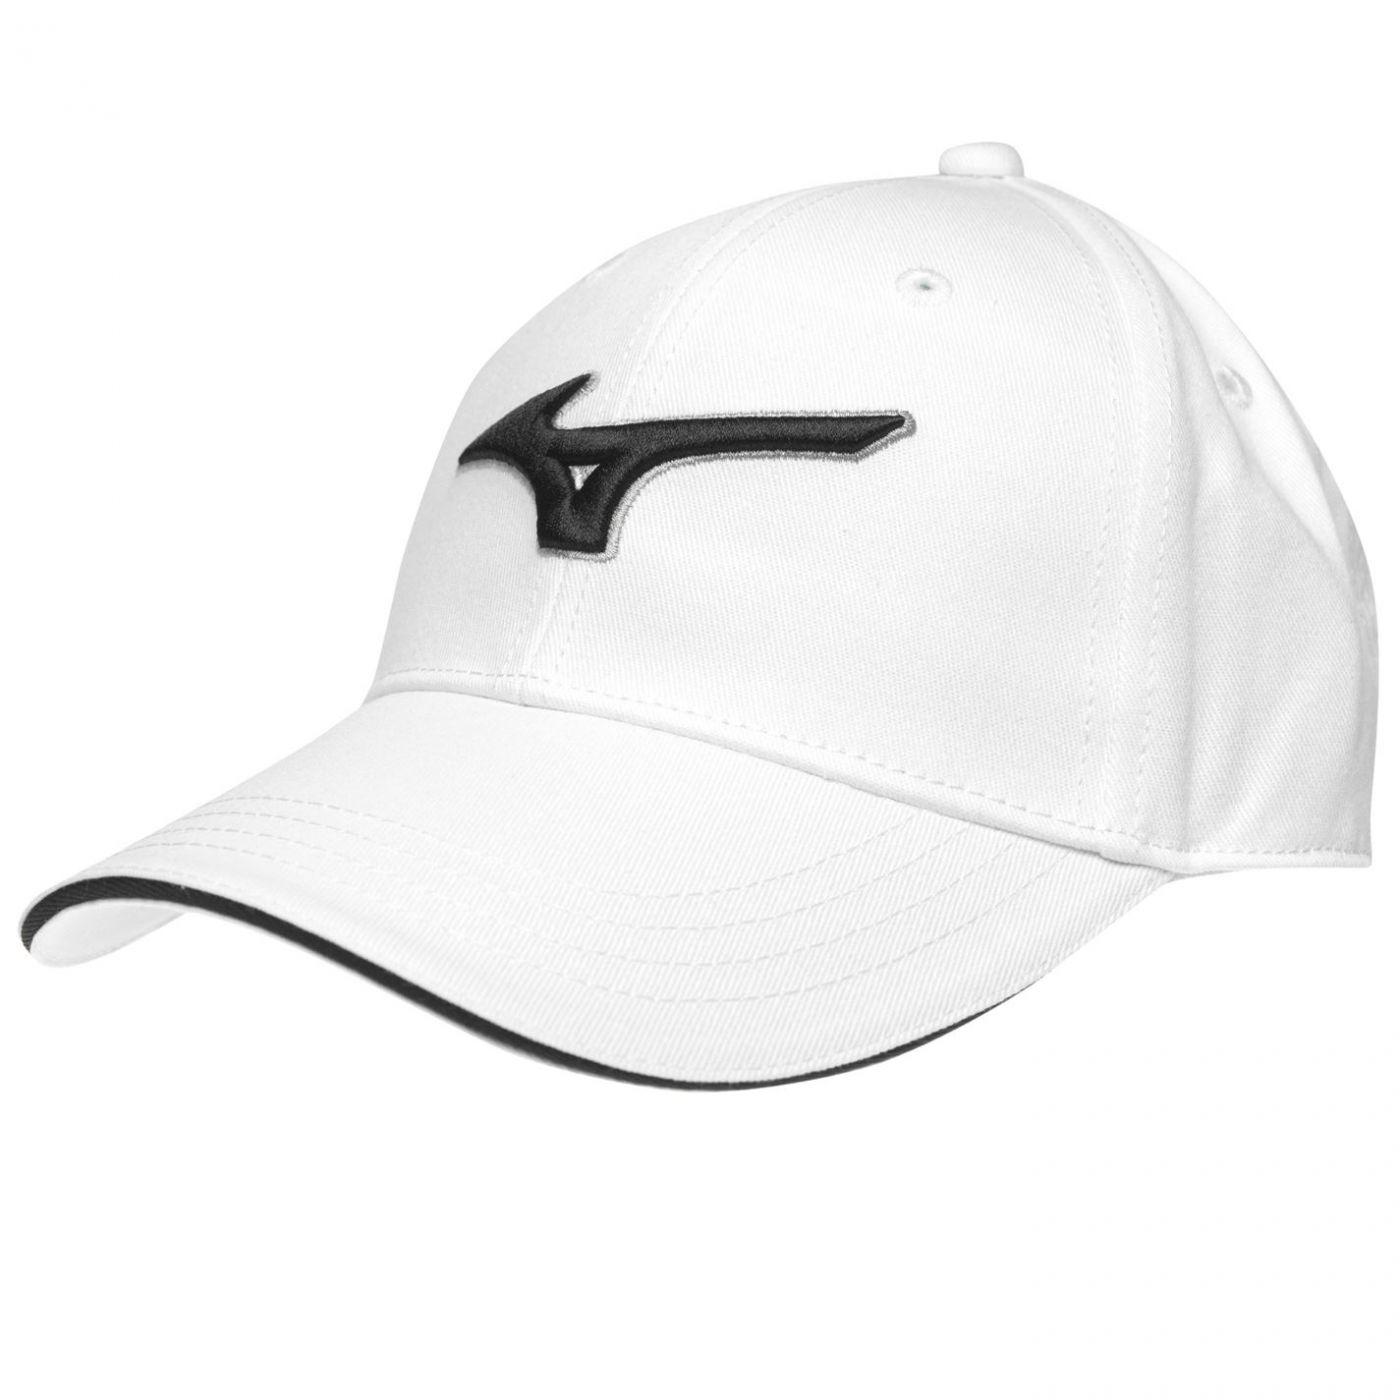 Mizuno Cotton Golf Cap Mens